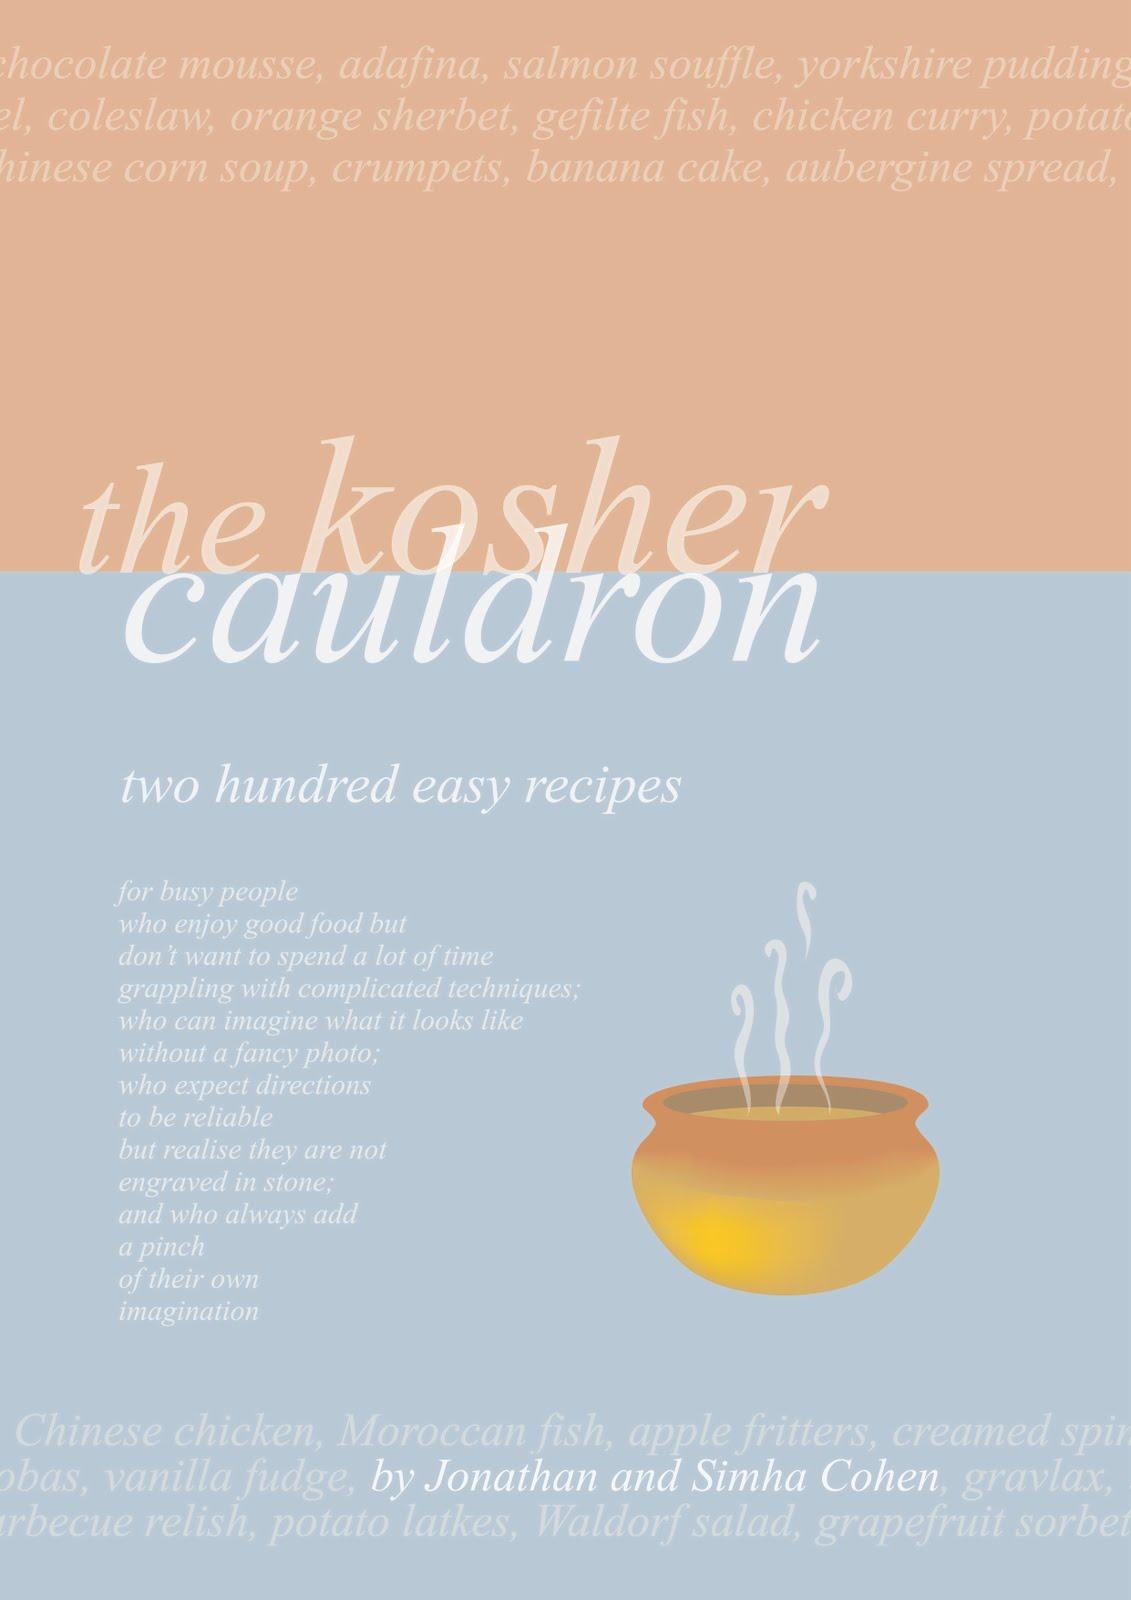 The Kosher Cauldron